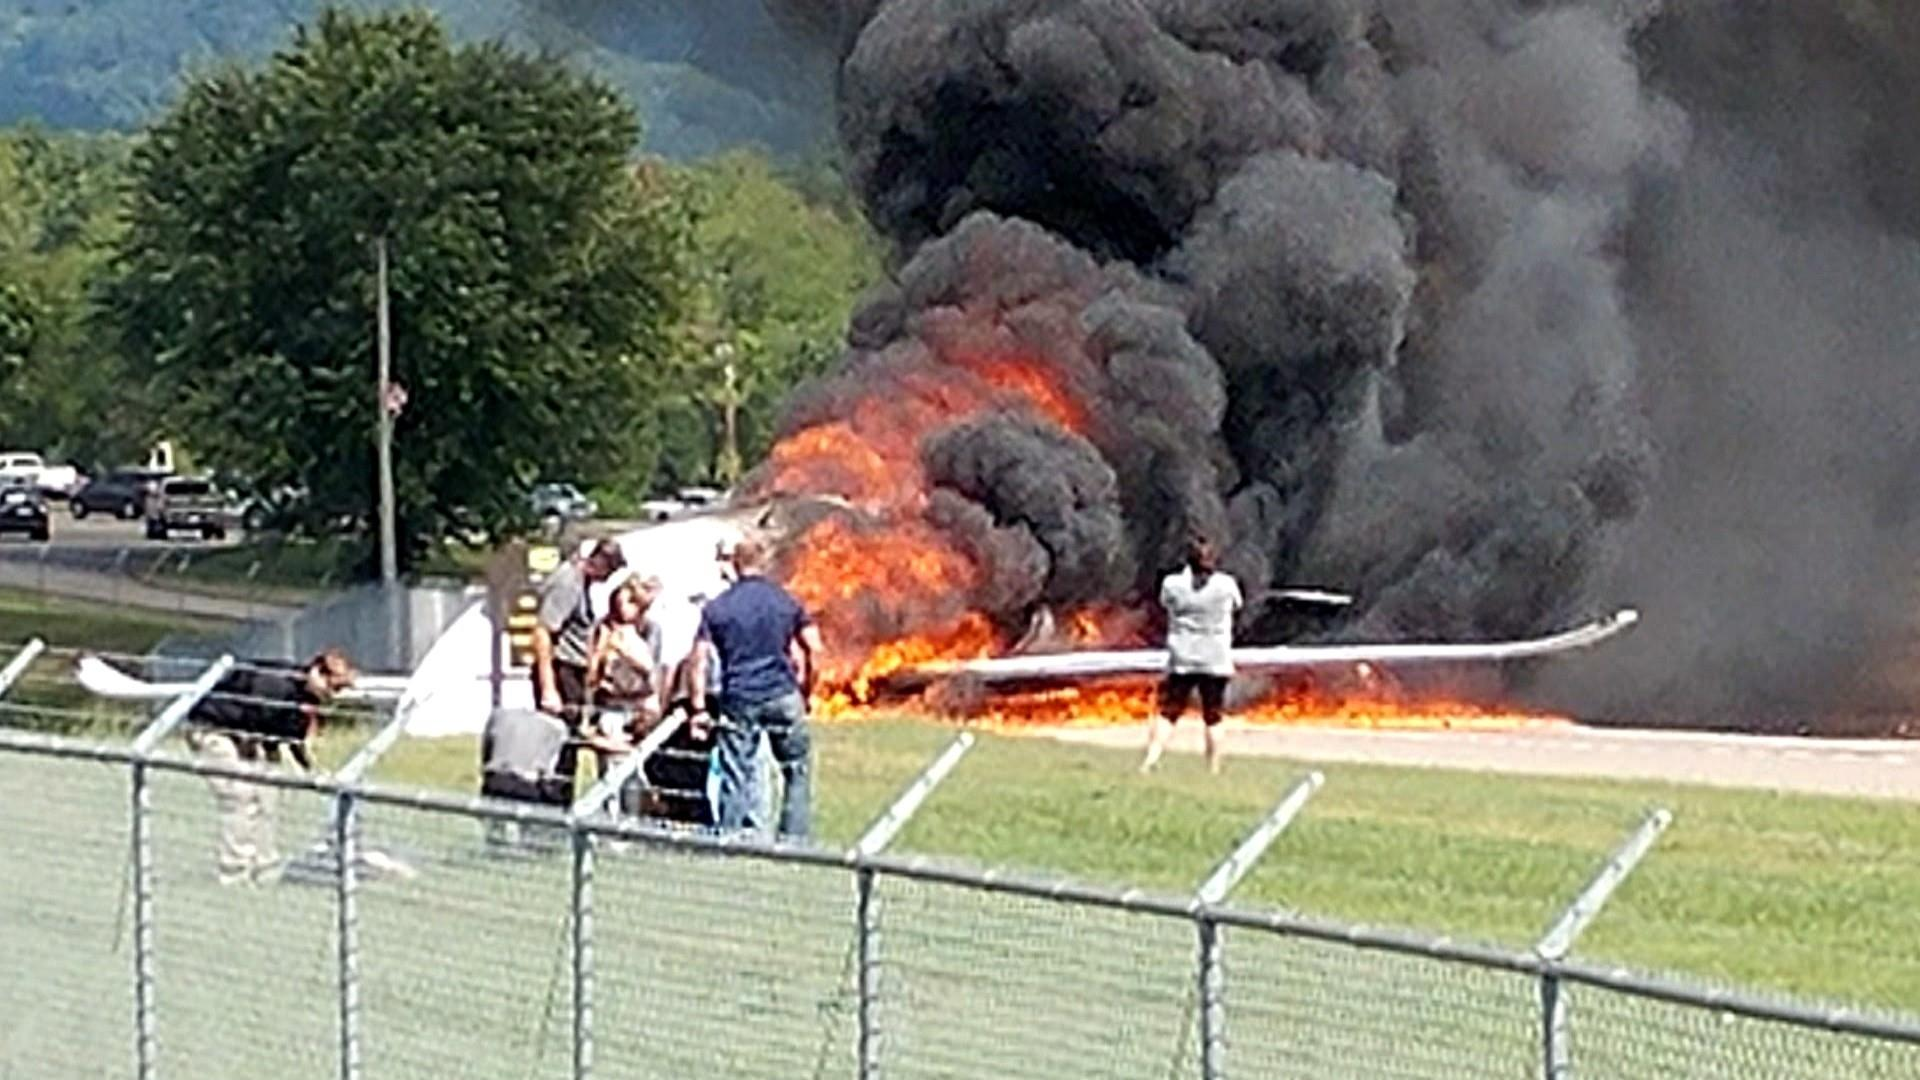 Dale Earnhardt Jr. plane crash: New details emerge